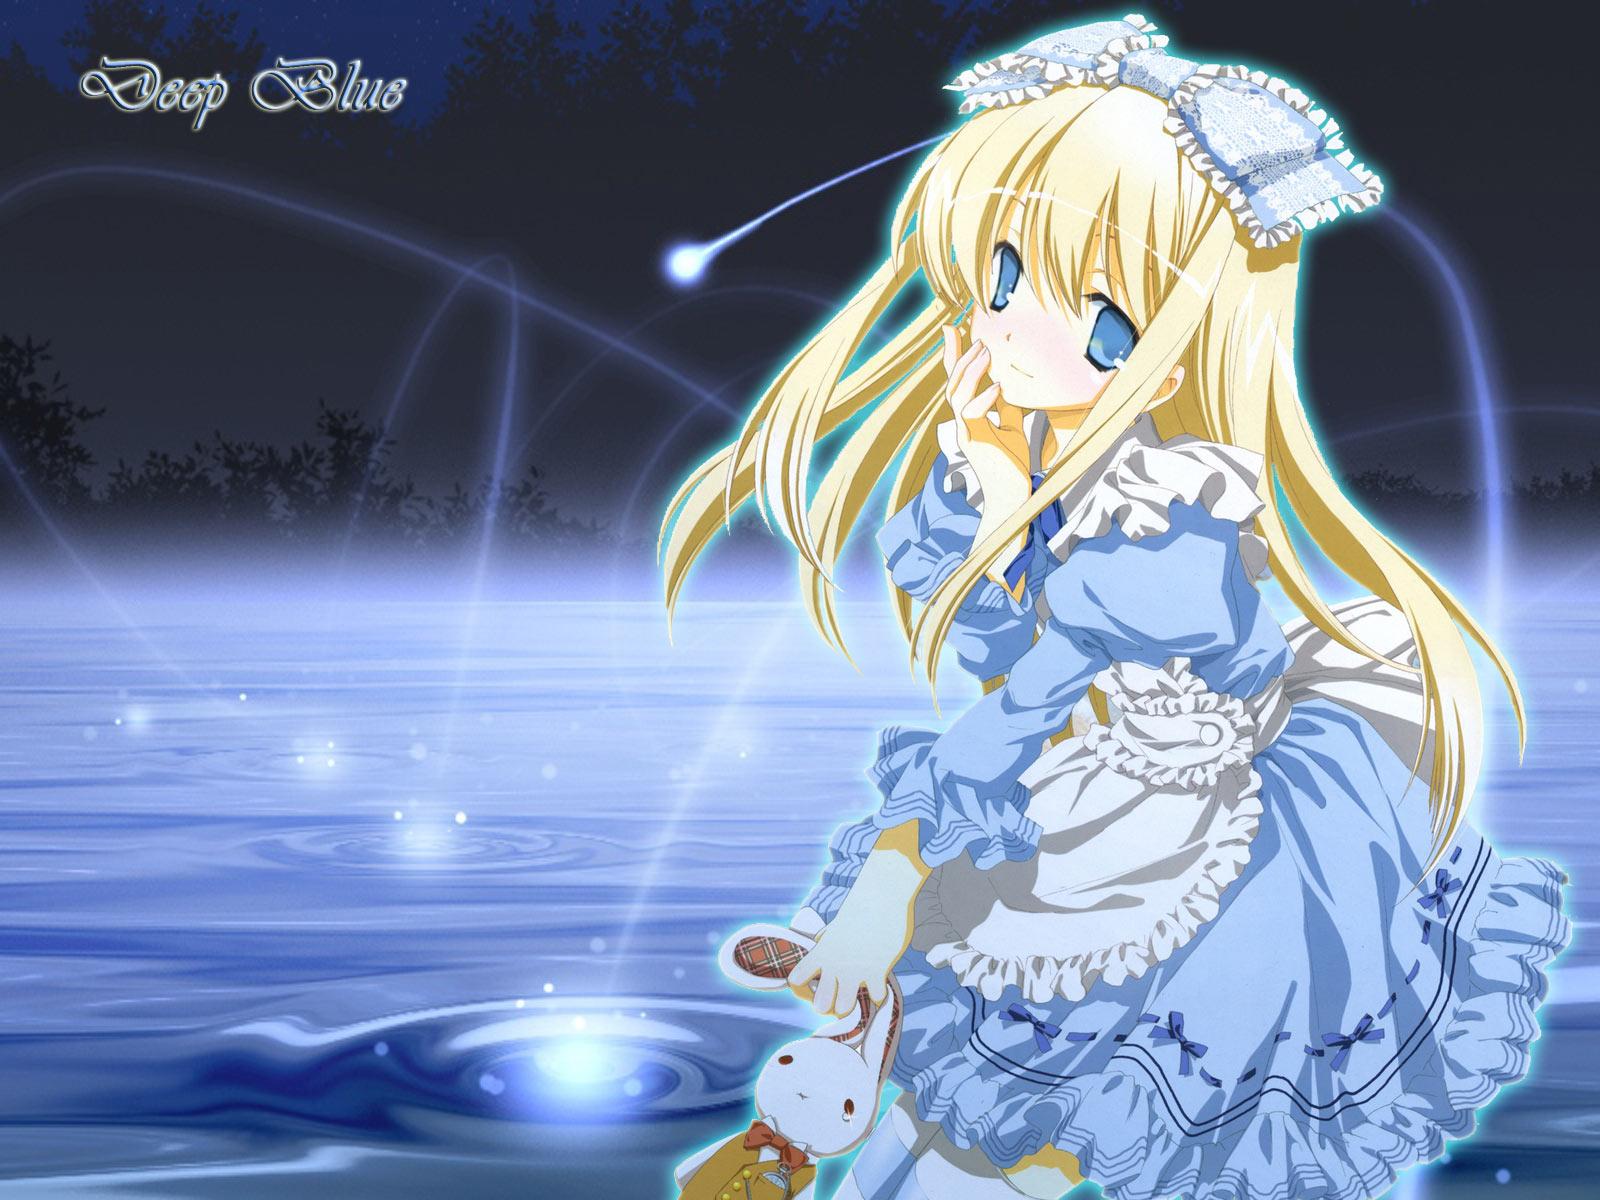 wallpaper blue girl animejpg 1600x1200